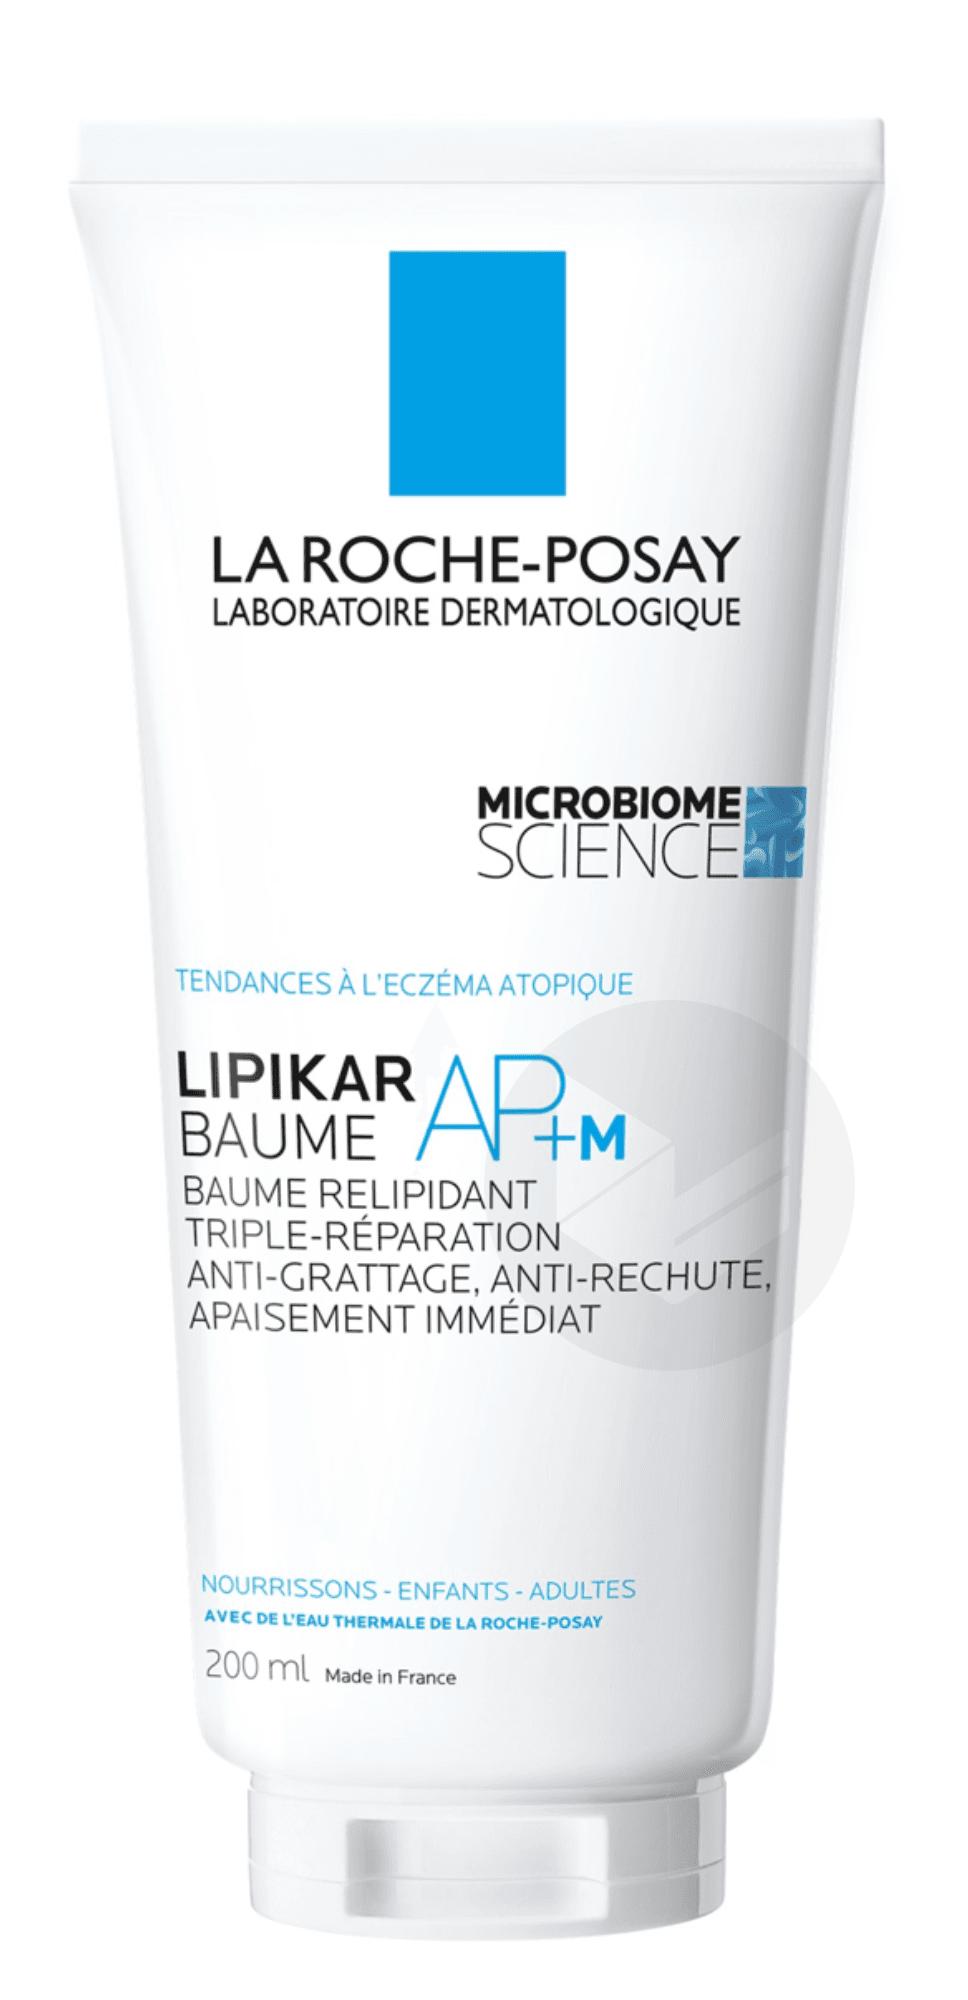 Lipikar Baume AP+ relipidant anti-irritation anti-grattage 200ml